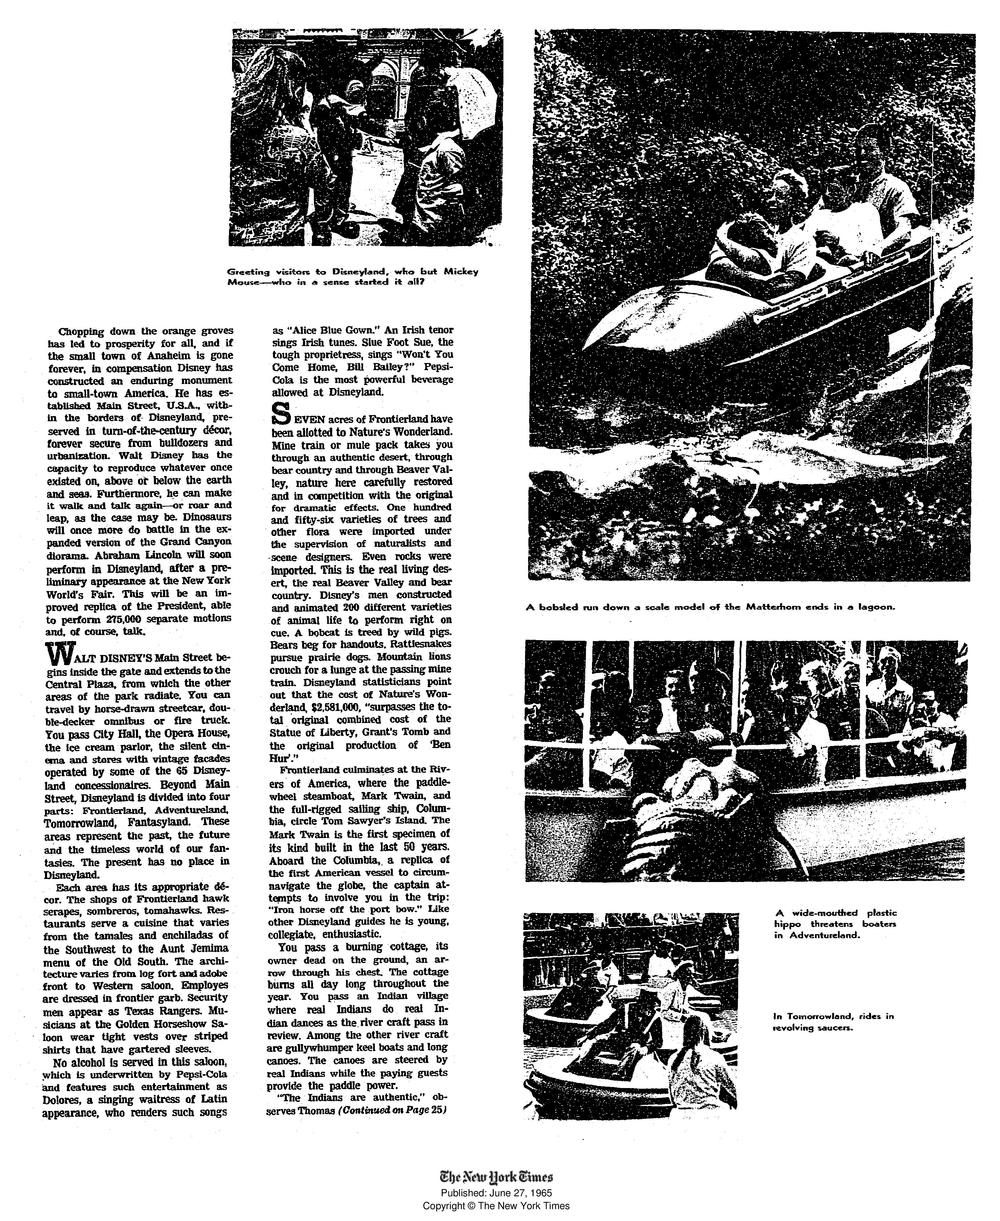 Fantasy1965-page-002.jpg